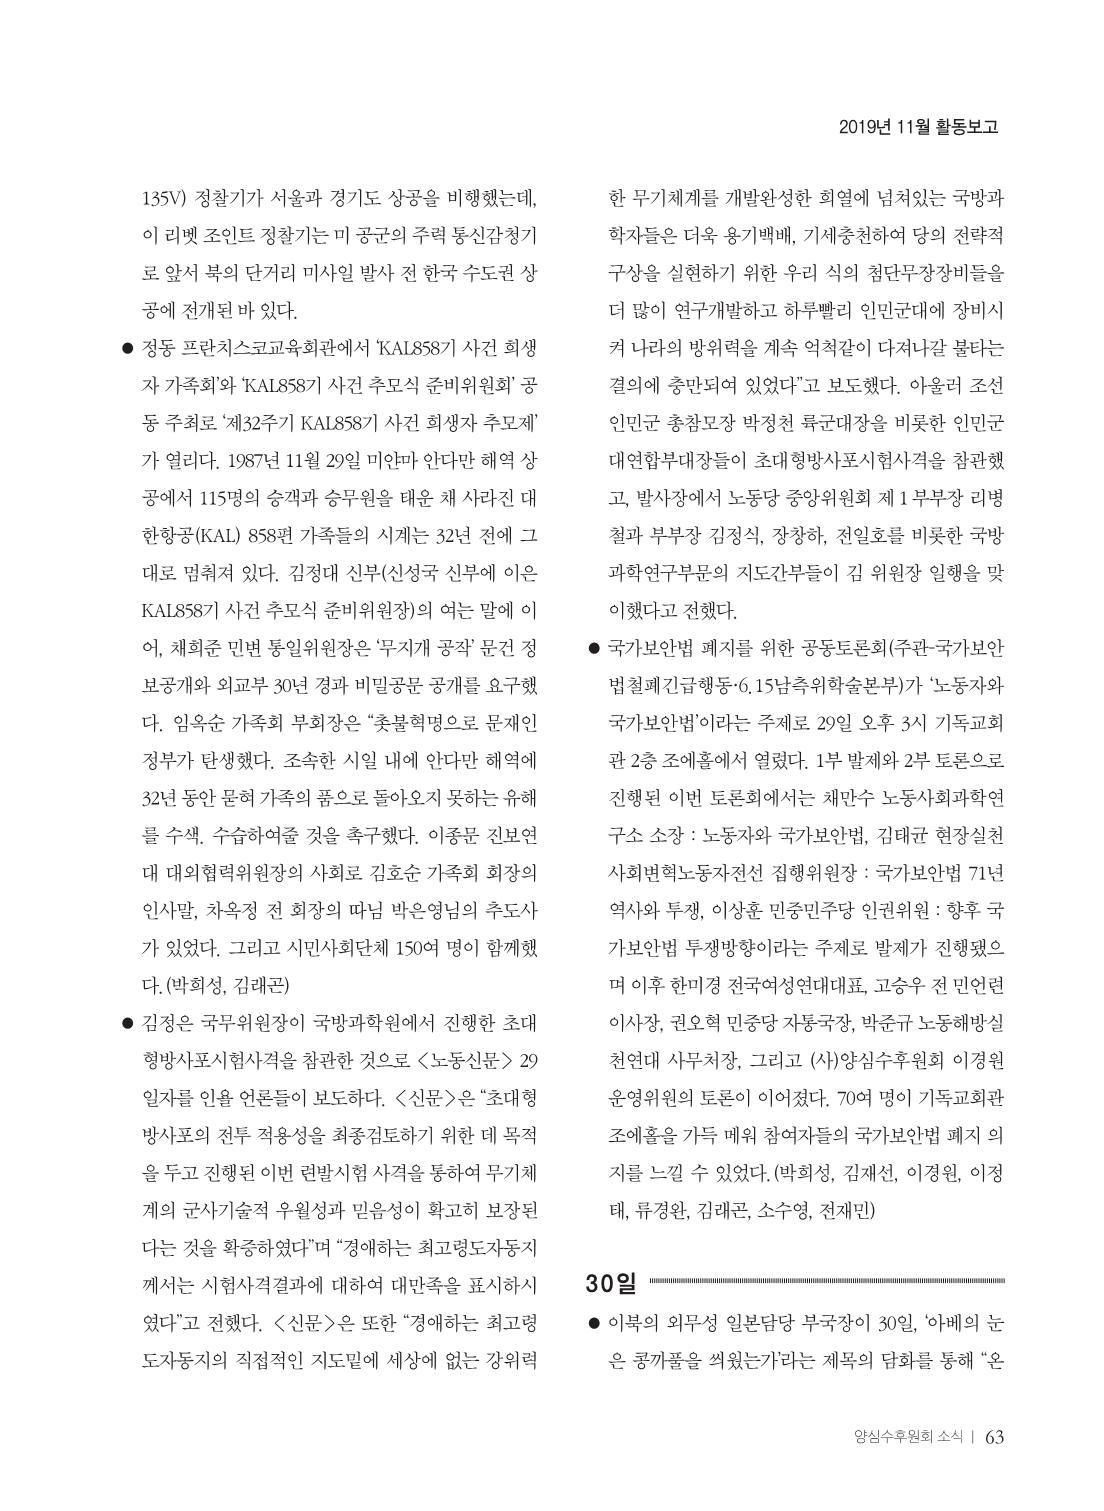 5802db1f-6a90-451c-ac2e-da2a23bee939.pdf-0065.jpg